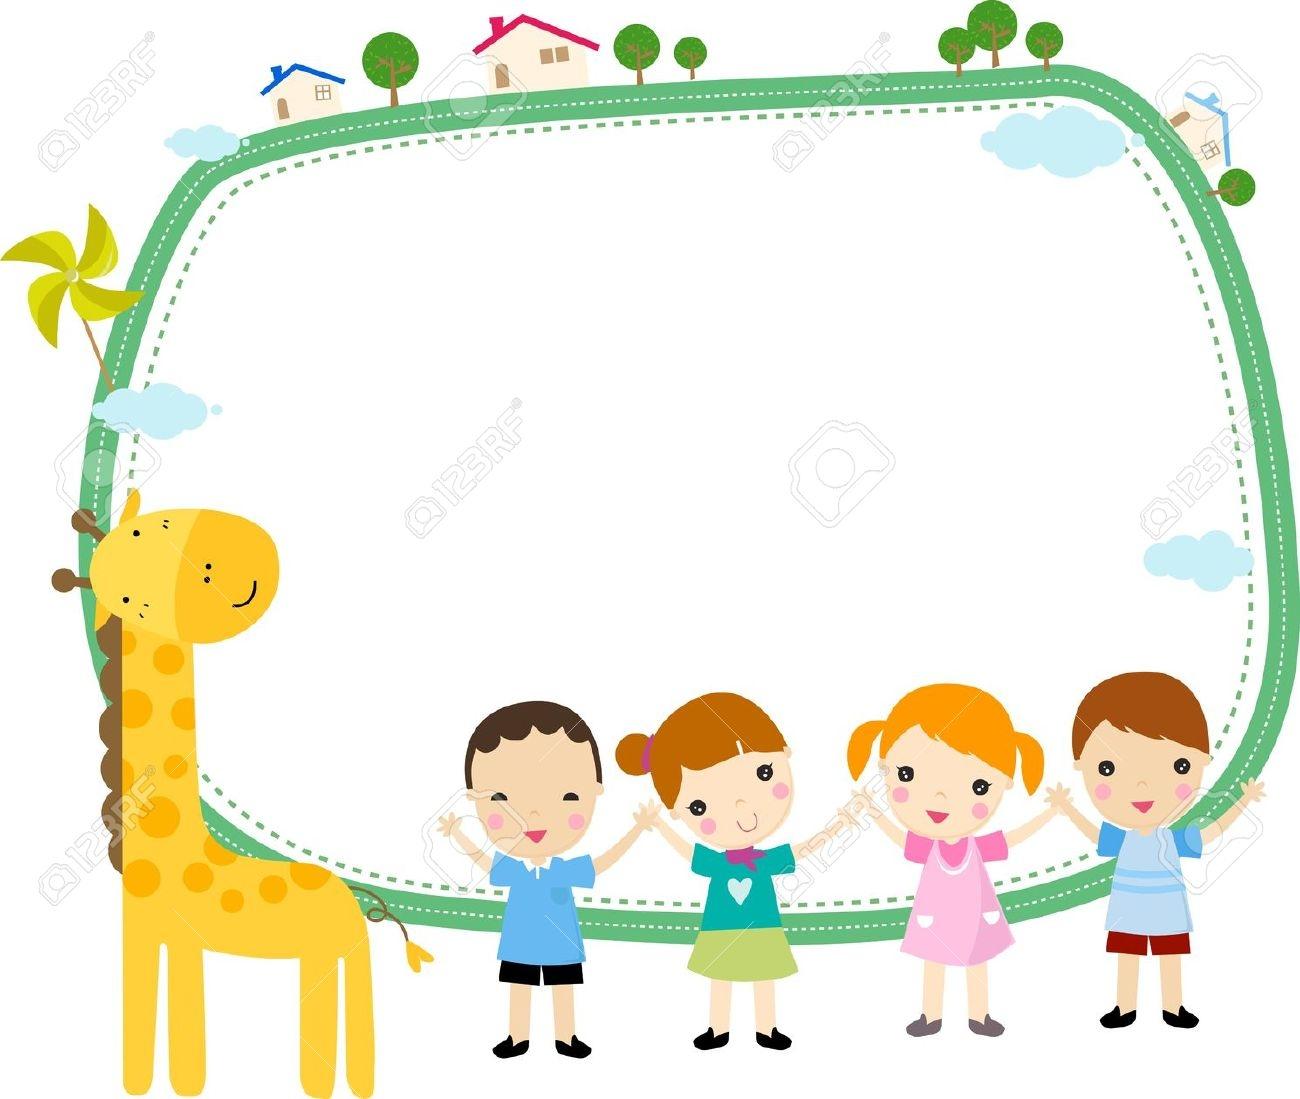 Jpeg school border clipart png royalty free download Cute school border clipart - ClipartFest png royalty free download